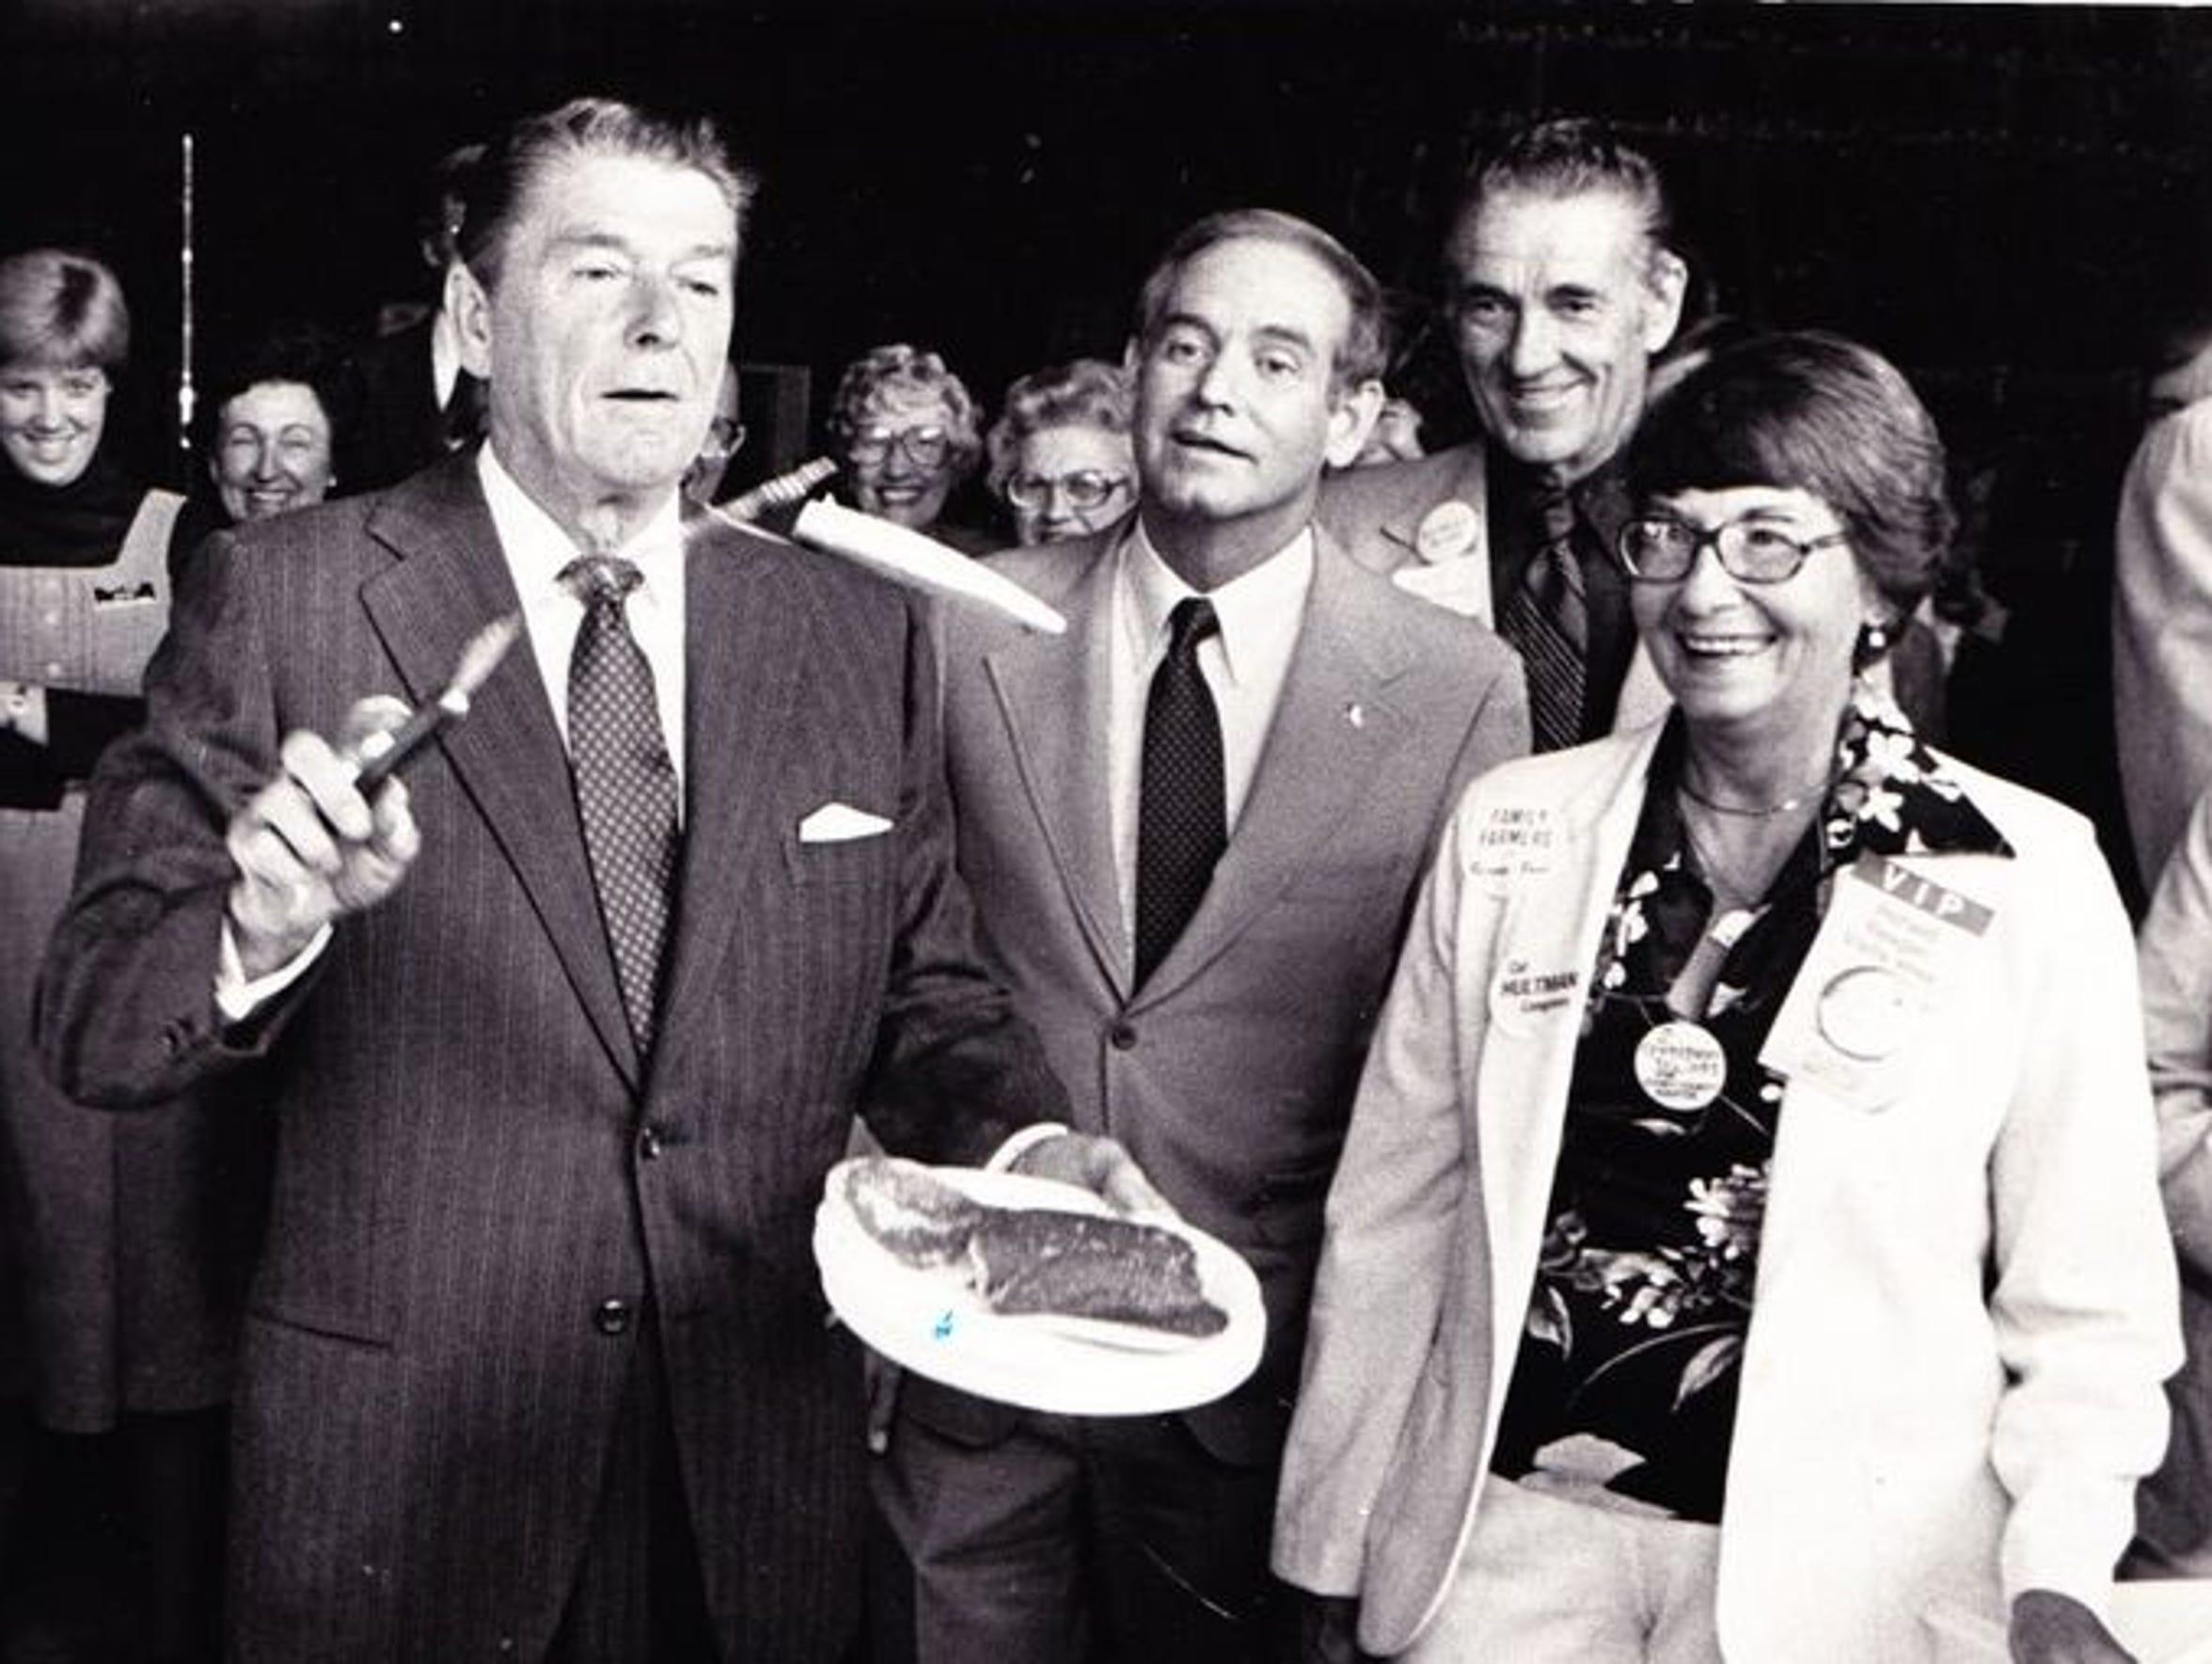 Ronald Reagan flips pancakes for breakfast next to